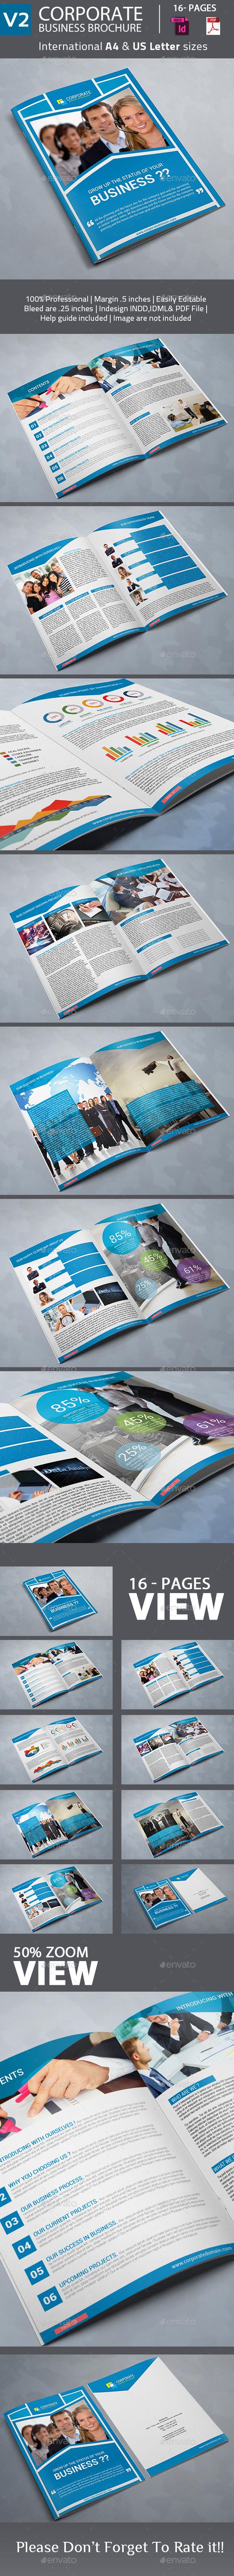 Corporate Business Brochure - Corporate Brochures